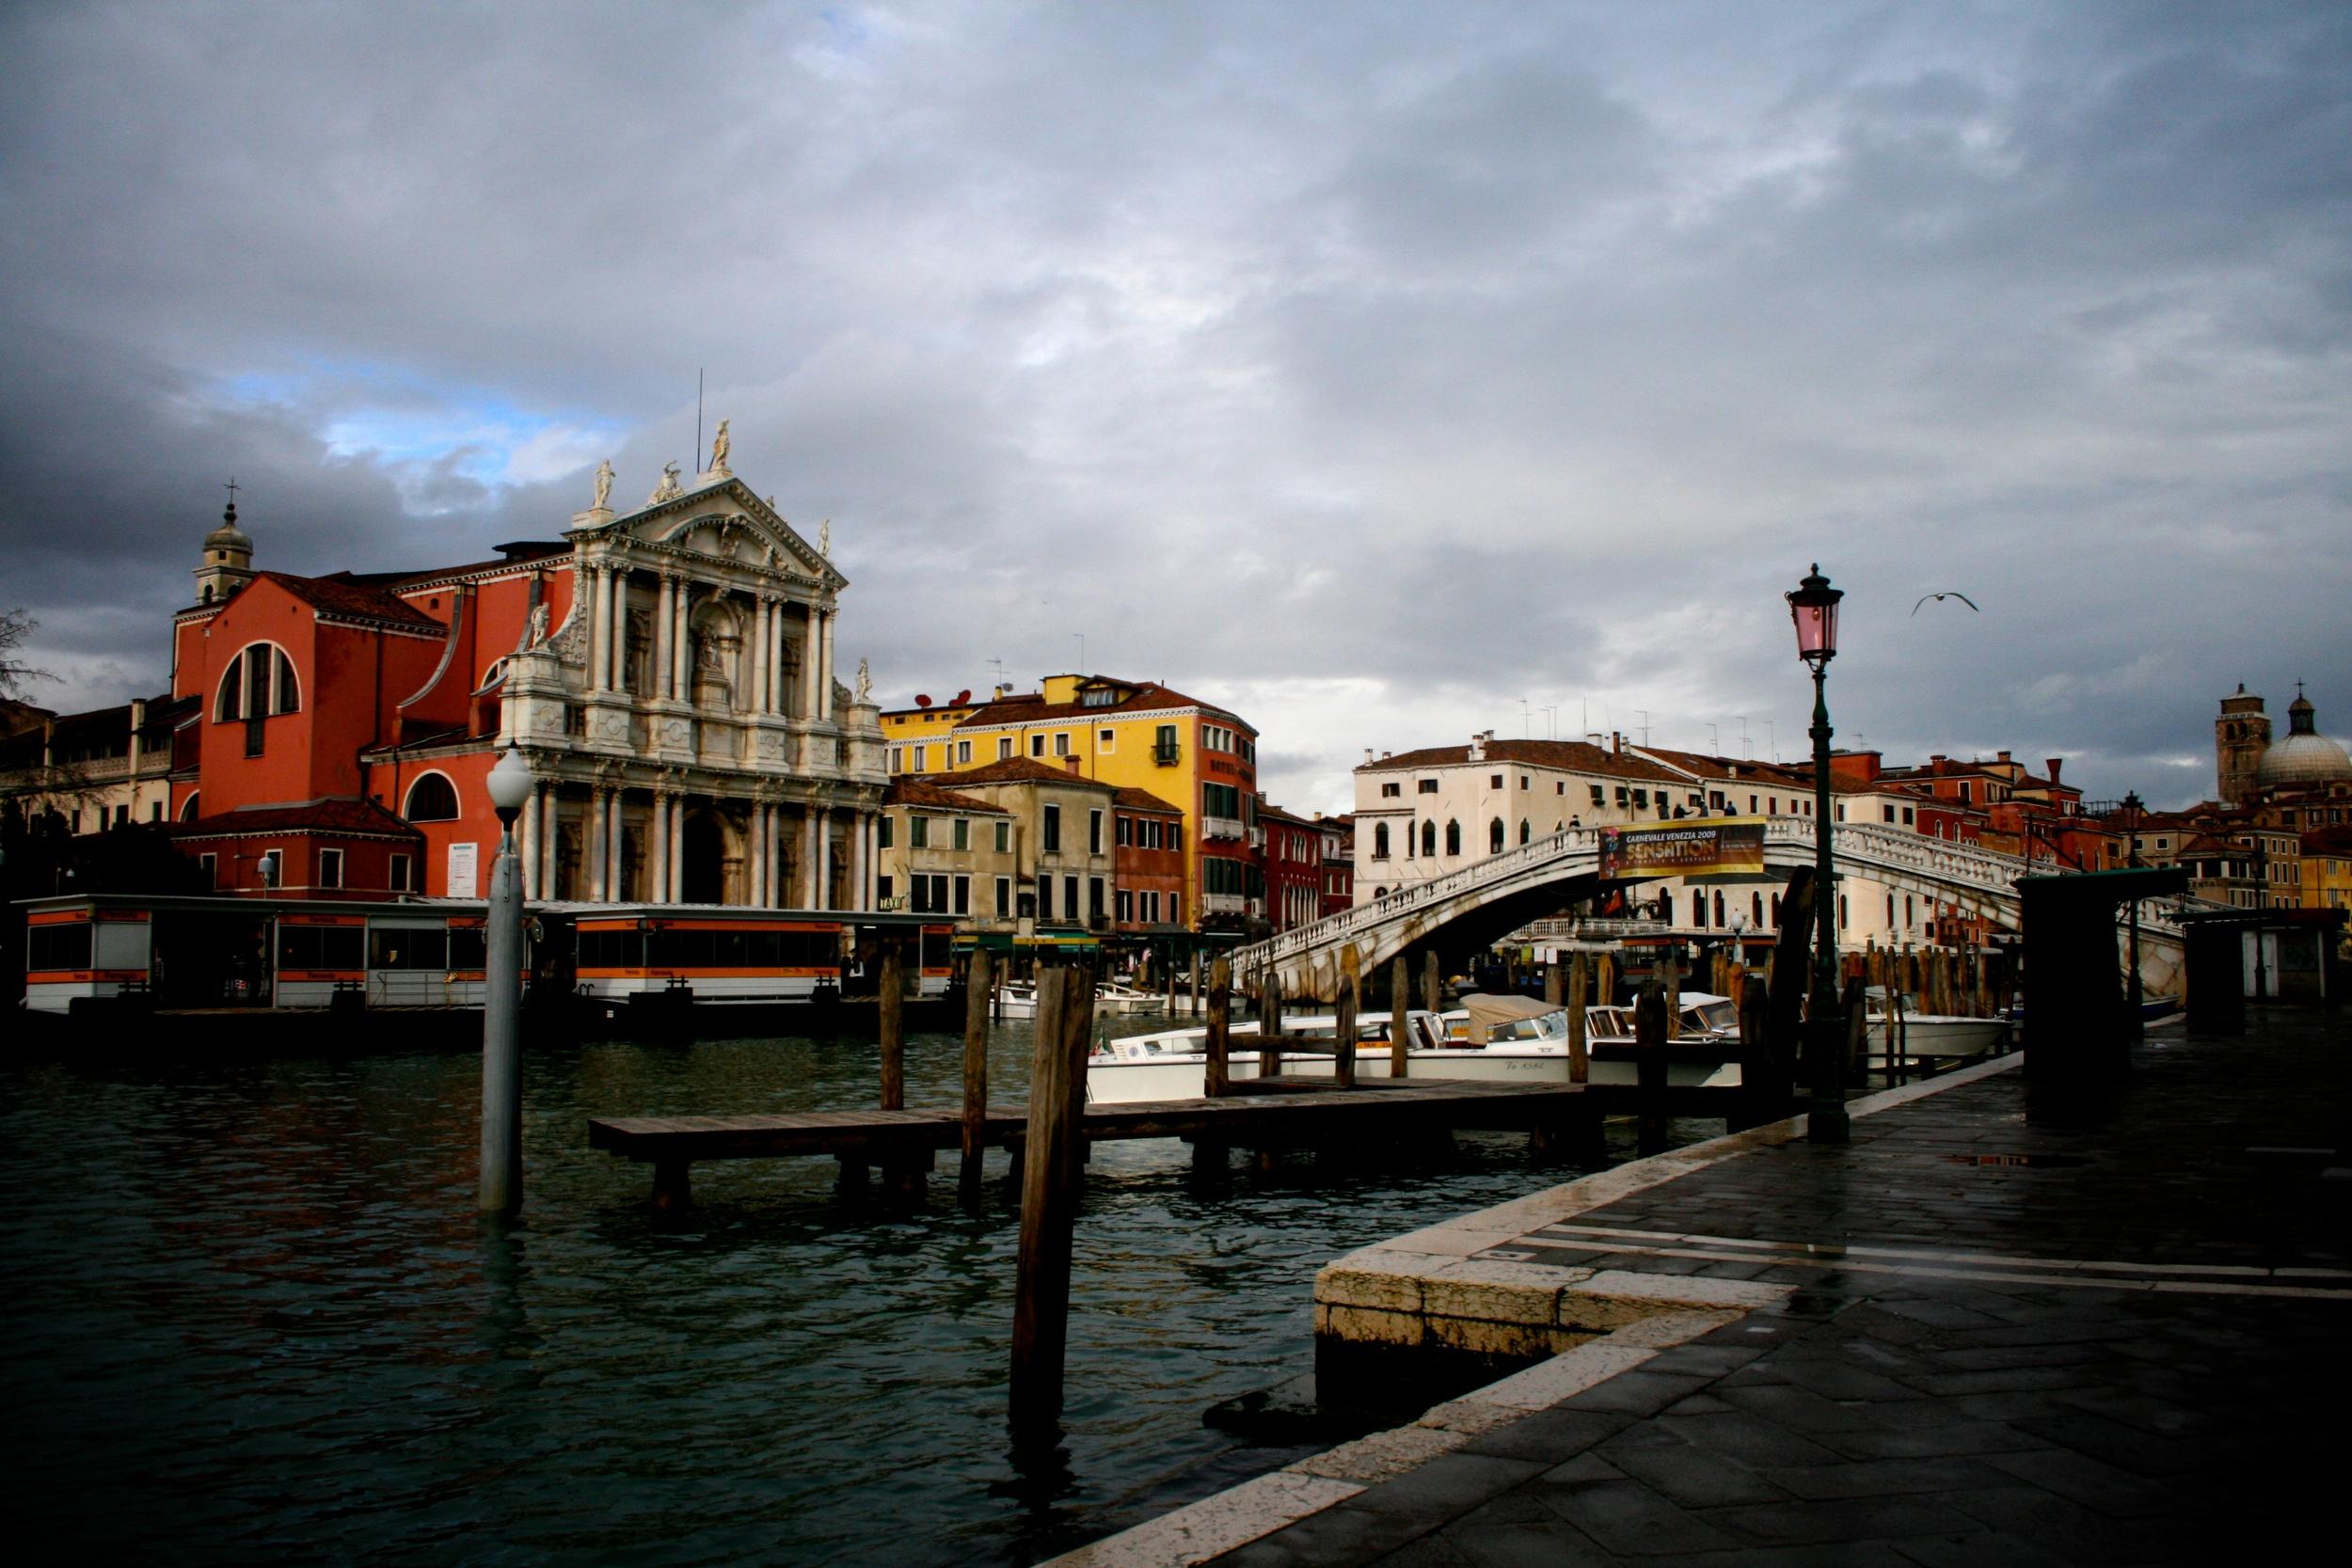 Canals, Venice